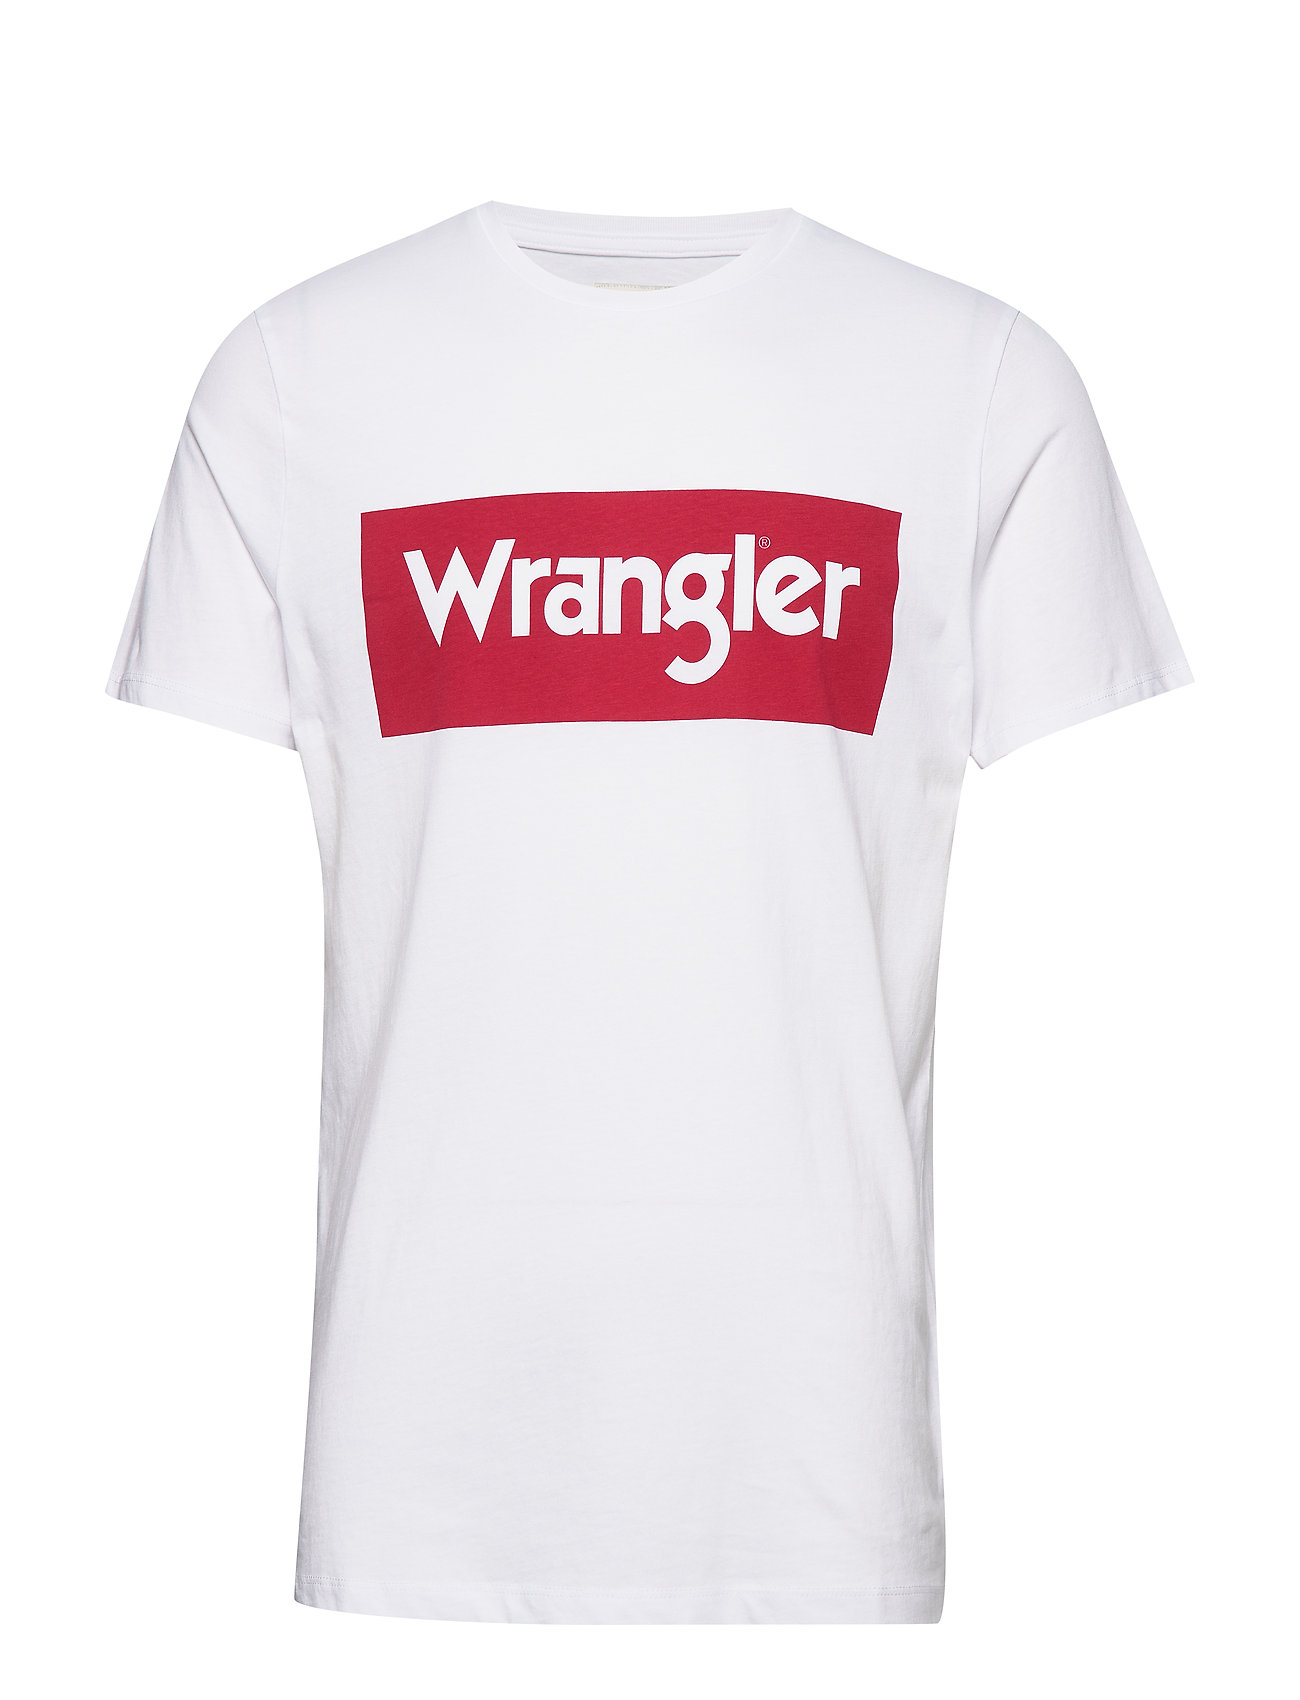 TeewhiteWrangler TeewhiteWrangler Ss TeewhiteWrangler Ss Logo Logo TeewhiteWrangler Ss Ss Logo Ss Logo jA5Lq3Rc4